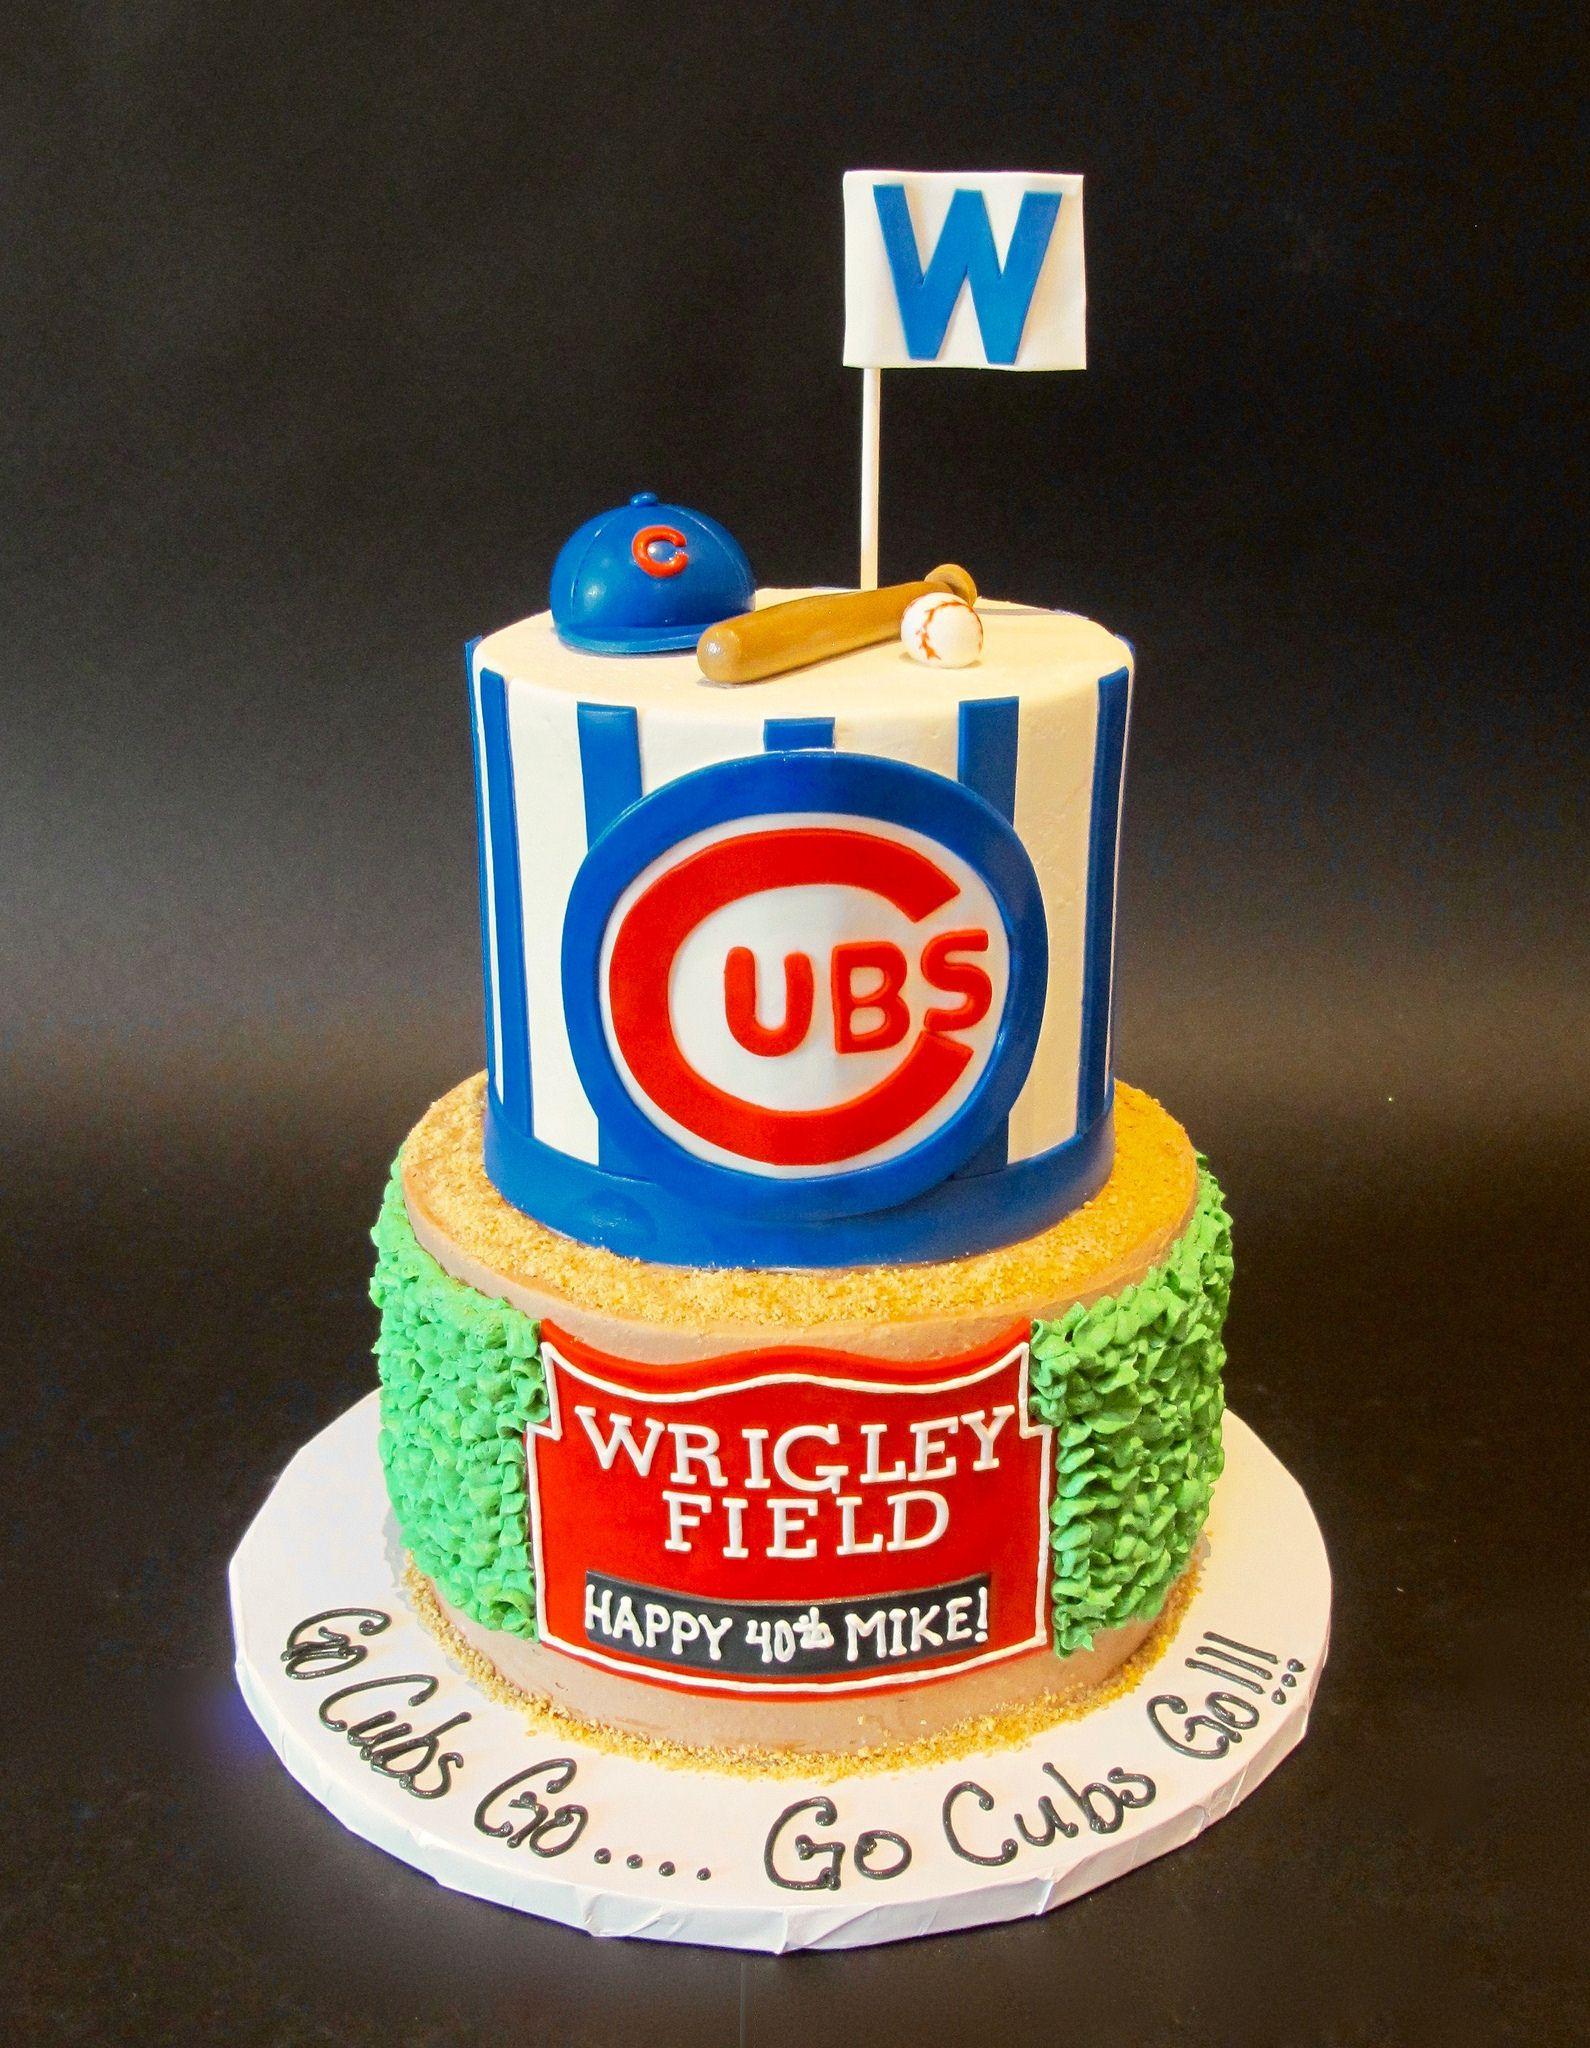 Birthday Cake With Wrigley Field Sign